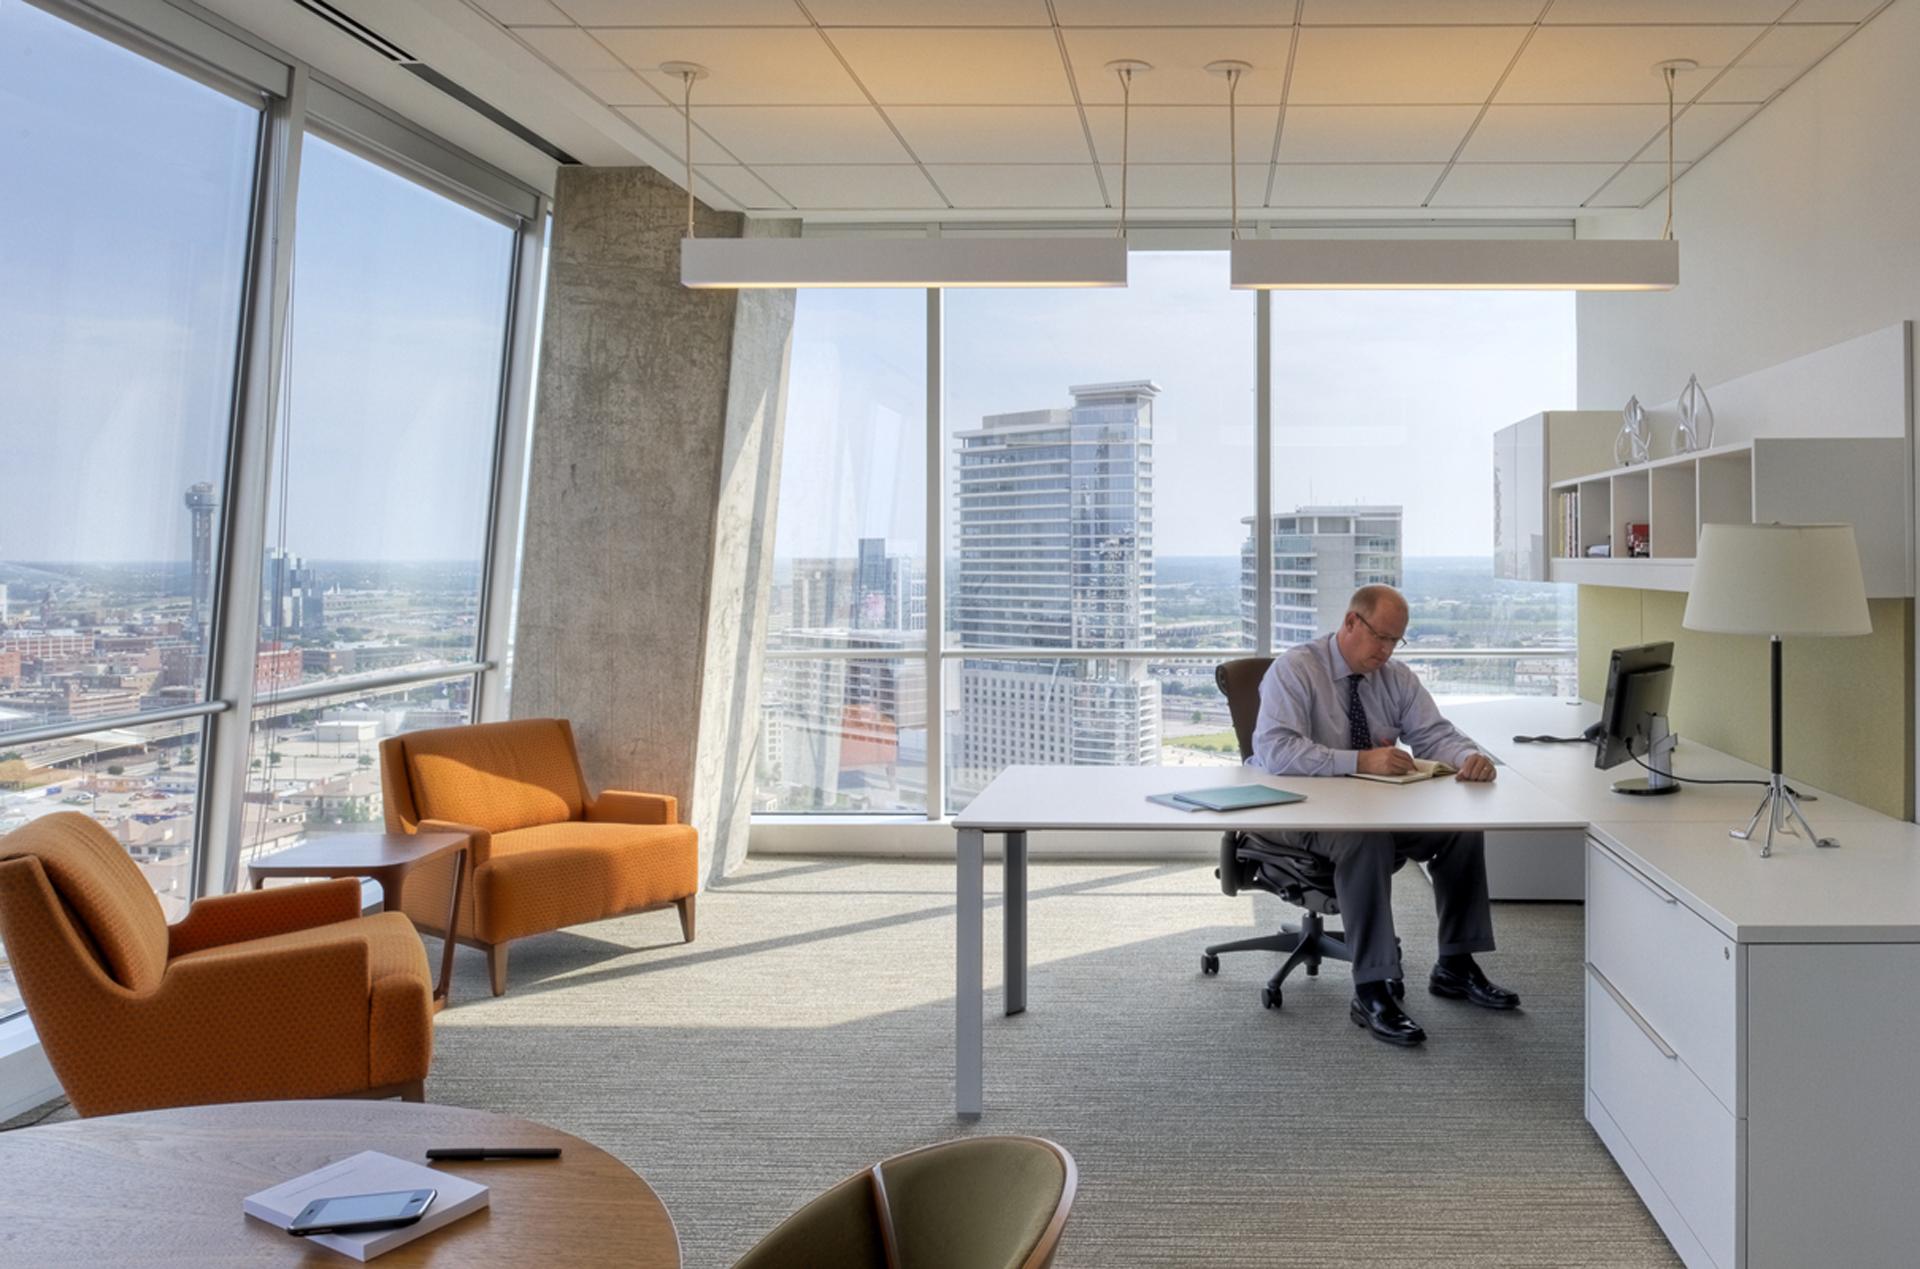 Pacific builders project for Design consultancy boston